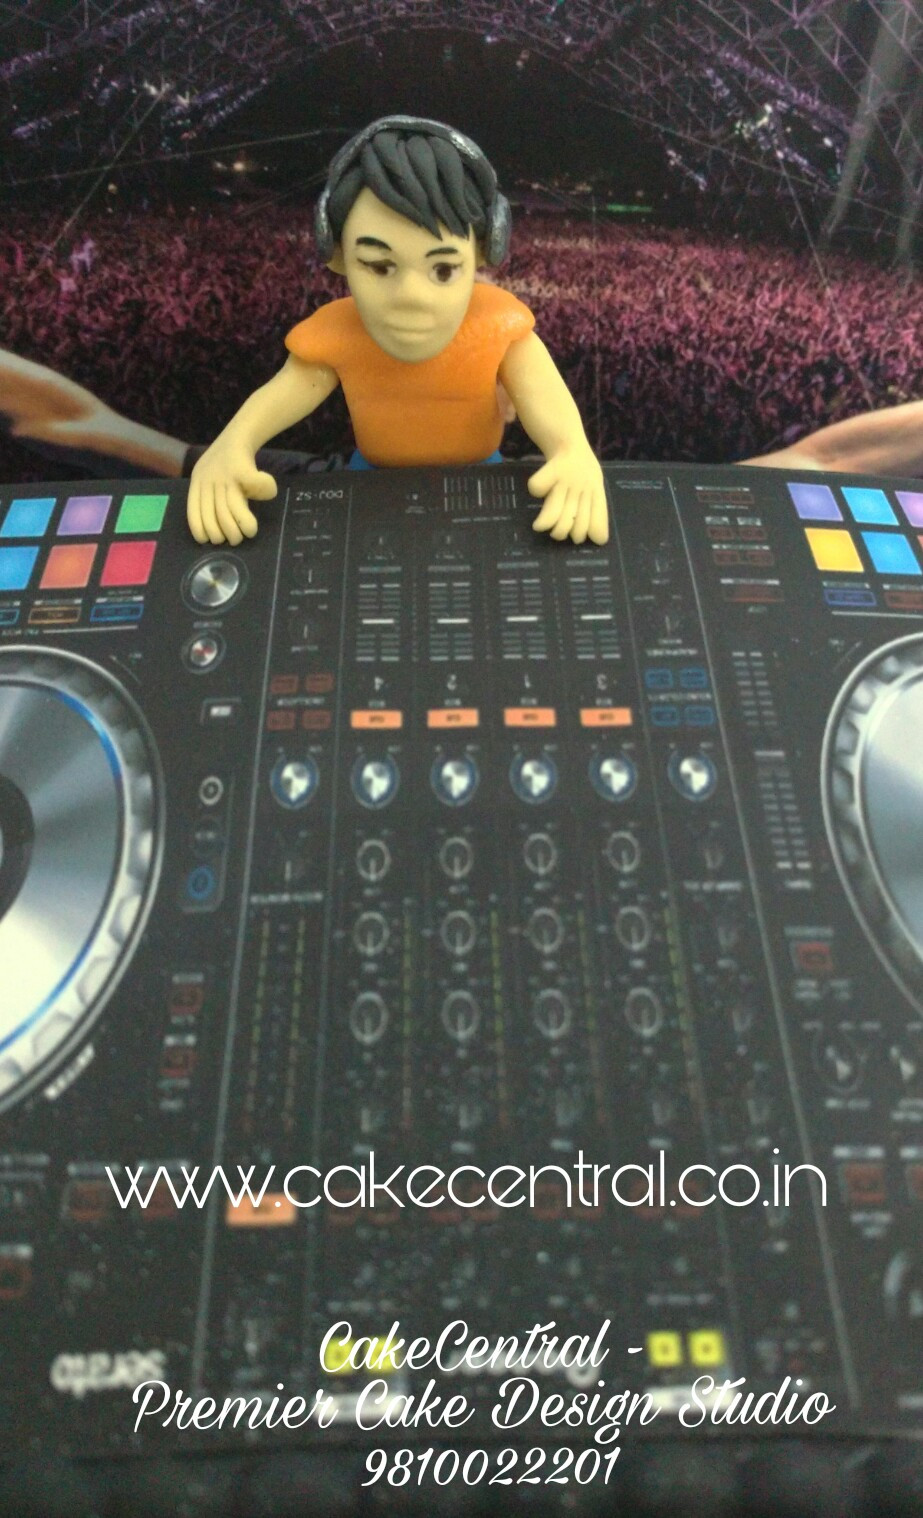 DJ Theme Cake Delhi , DJ theme Fondant Cake , Customized  Designer DJ theme Birthday Cake  , 4D DJ Cake Delhi by Cake Central - Premier Cake Design Studio Delhi 9810022201